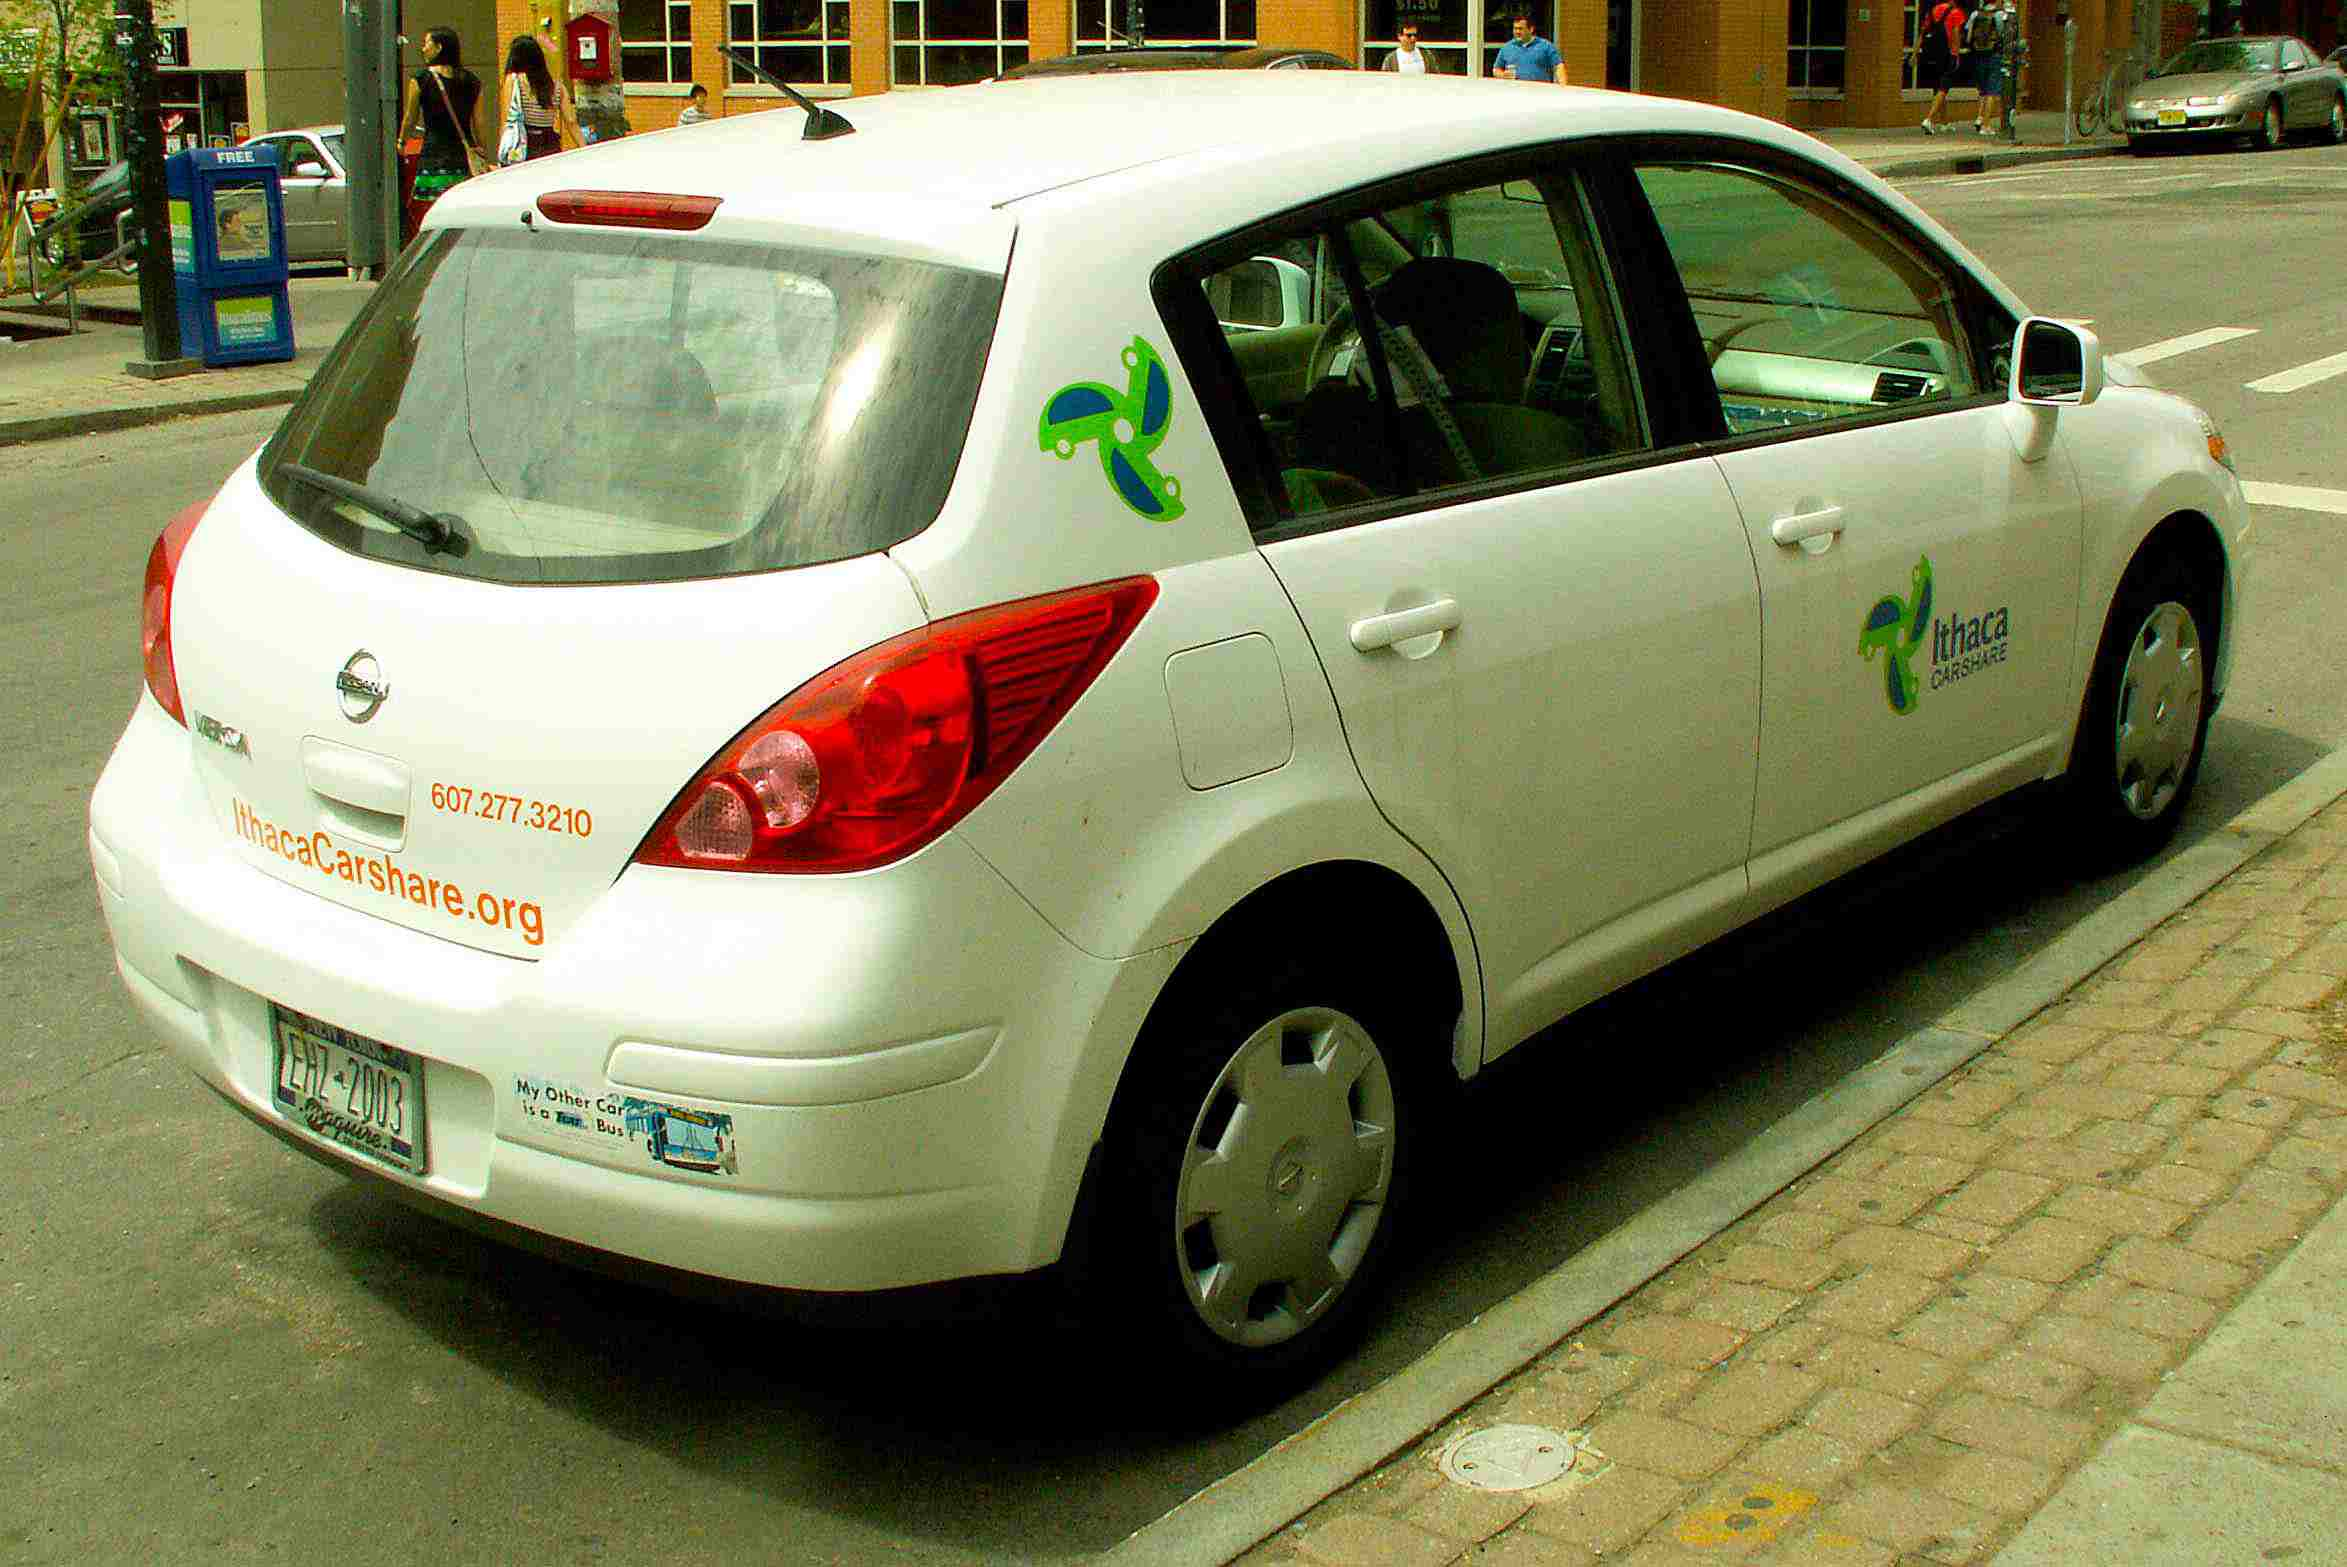 Ithaca Car Share